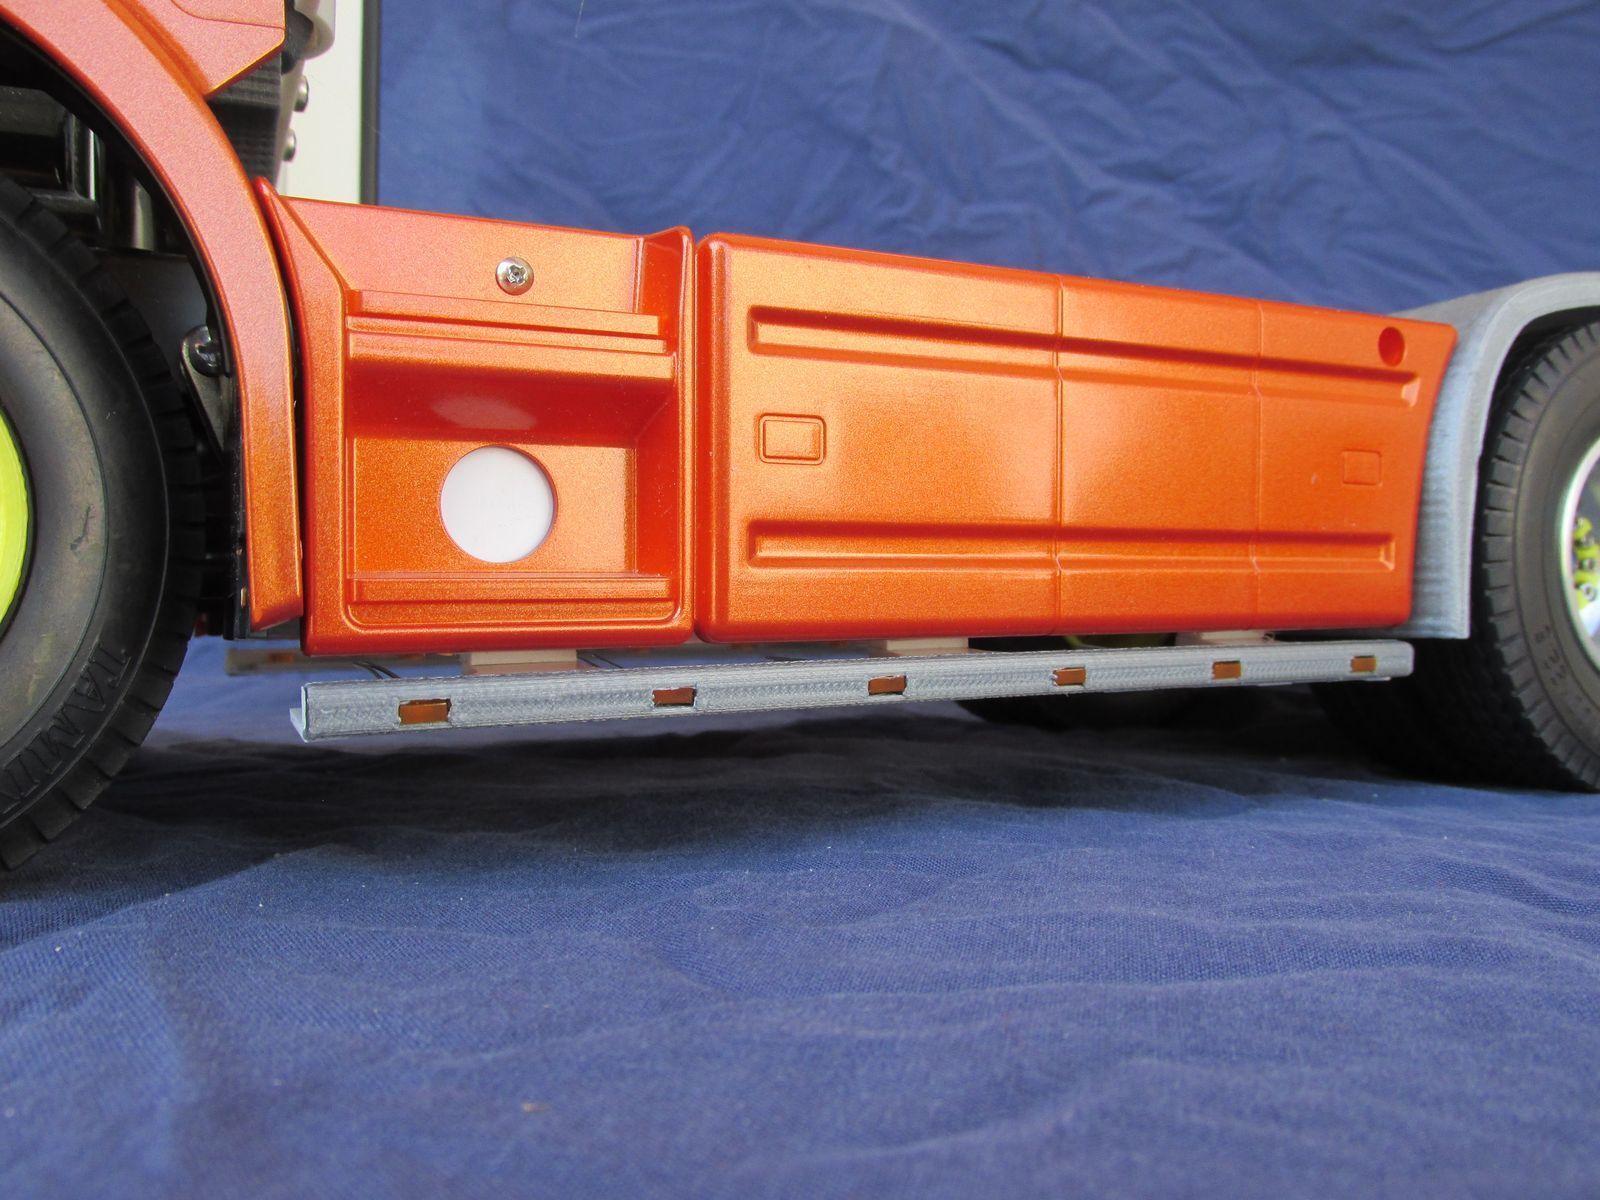 LLS2O - LED-Leistenpaar zu orig. Seitenstaukiste für Tamiya Scania Scania Scania 2-Achs M1 14 f9f9de